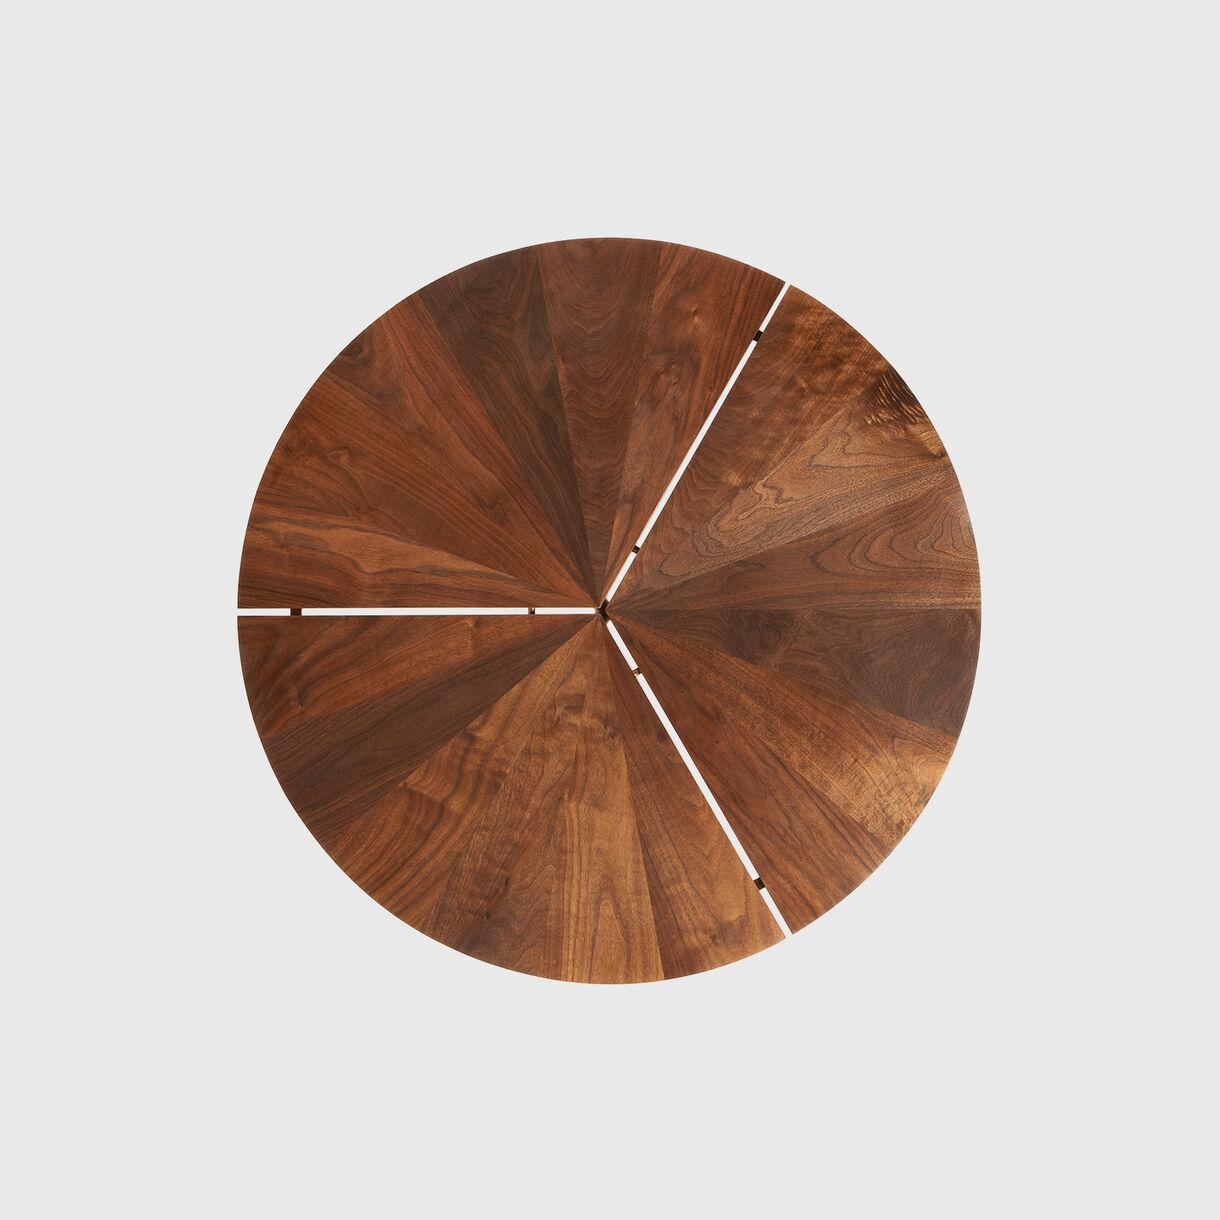 Circular Coffe Table